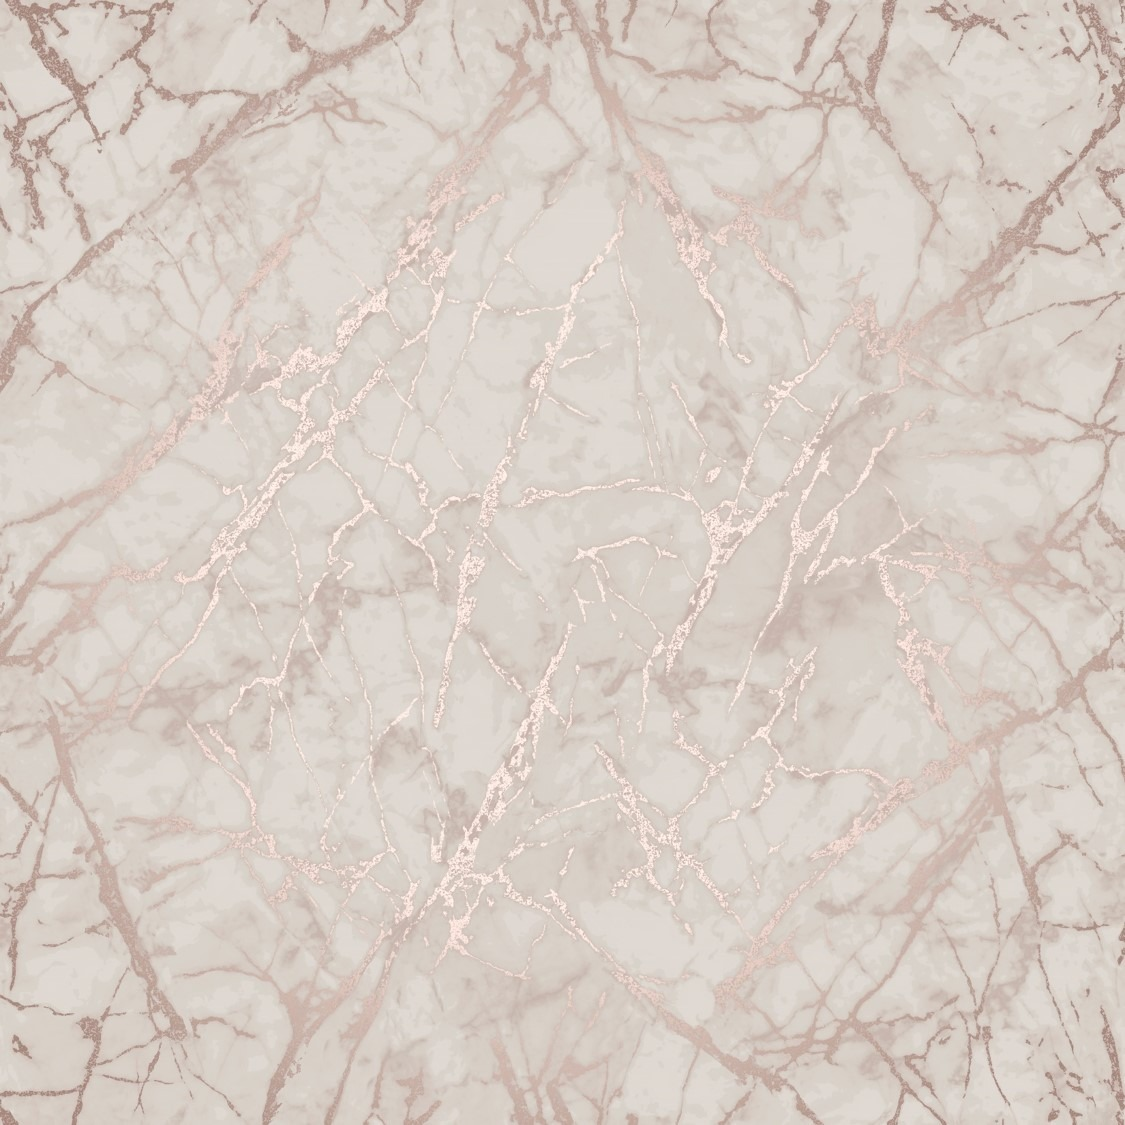 Metallic Marble Wallpaper Rose Gold Fine Decor Fd42268 Wallpaper Sales